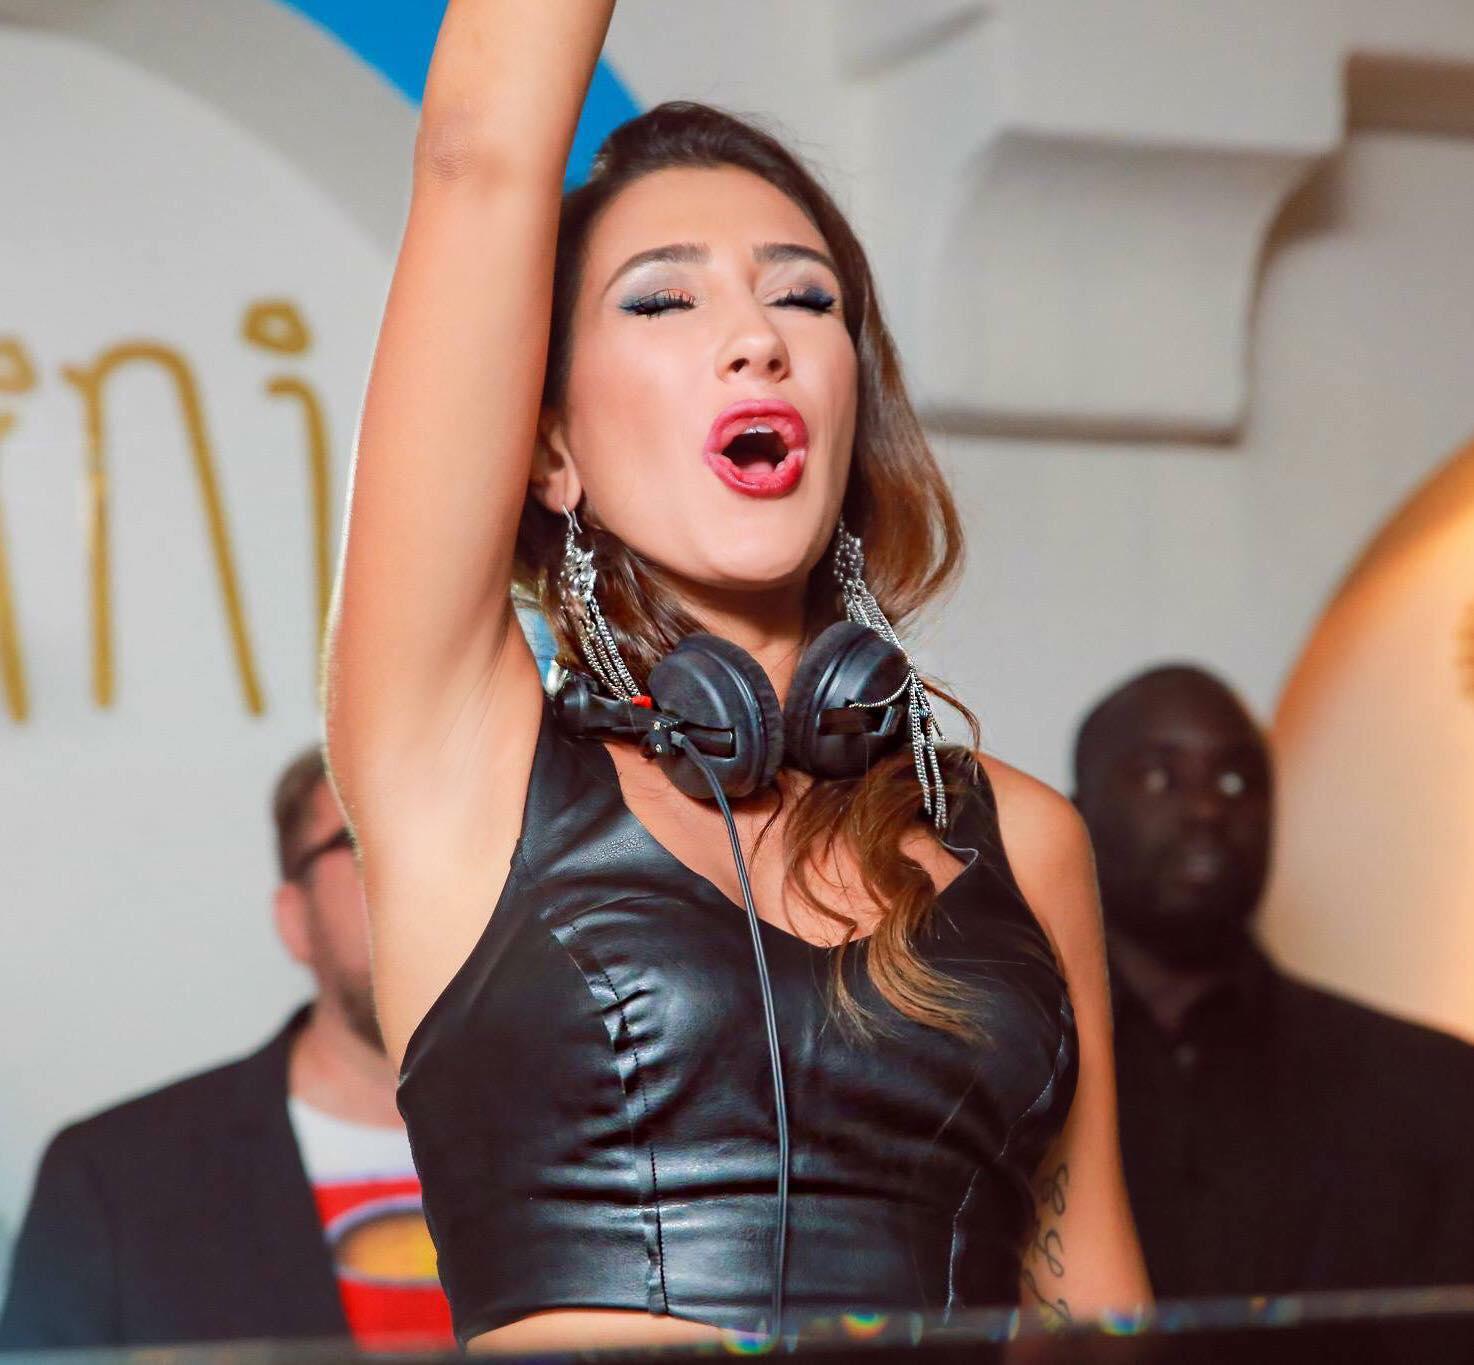 Nikita #Costez a Telgate (BG), Candy Party: 16/6 Keller, 17/6 Jessie Diamond